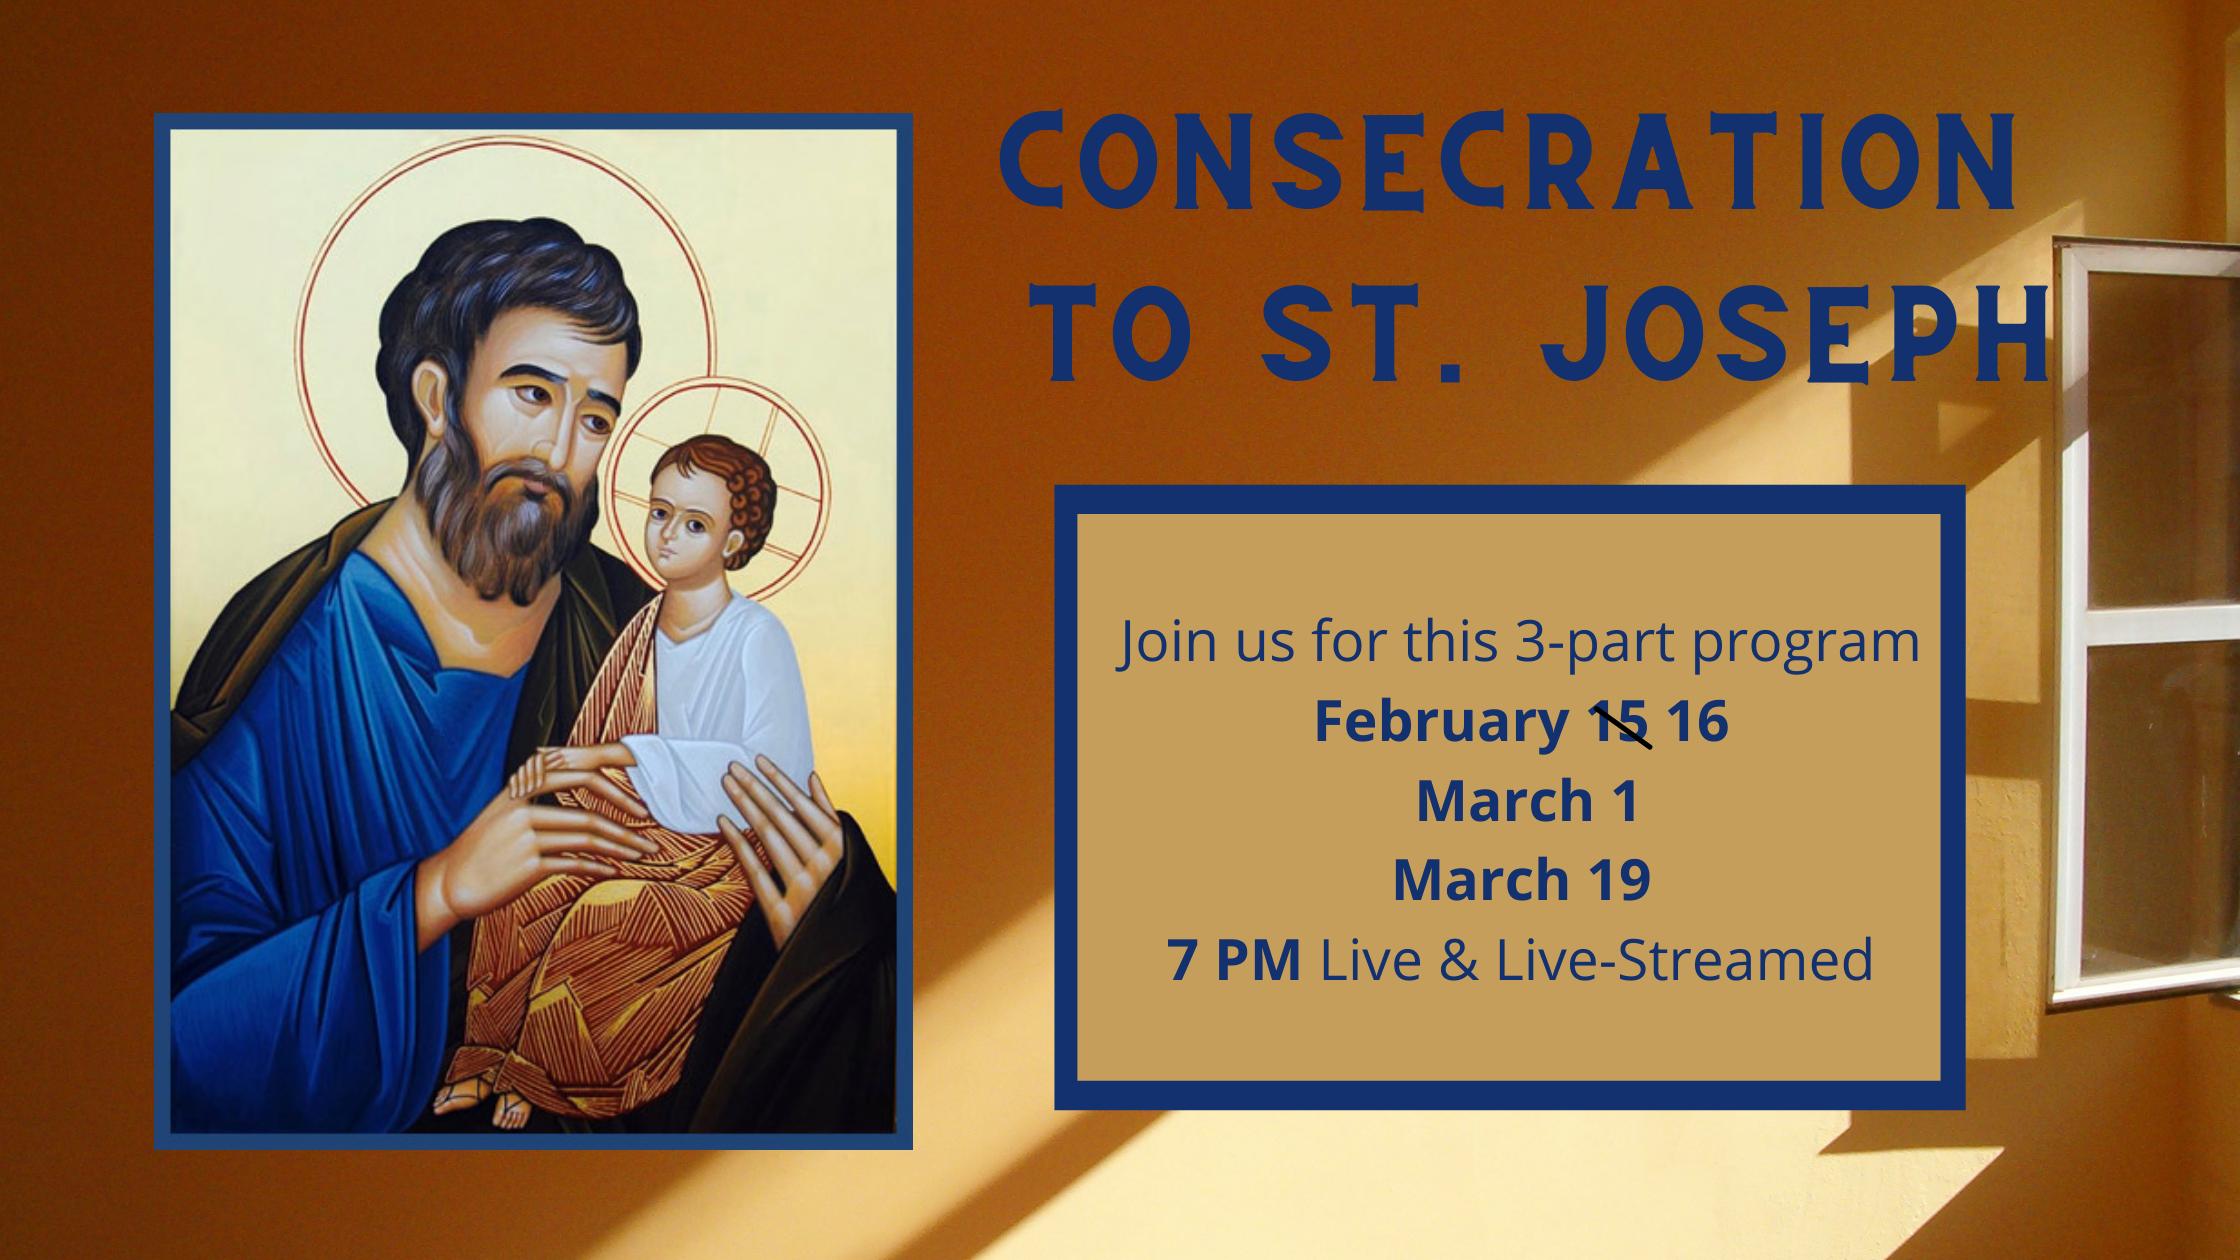 consecration to st. joseph-16